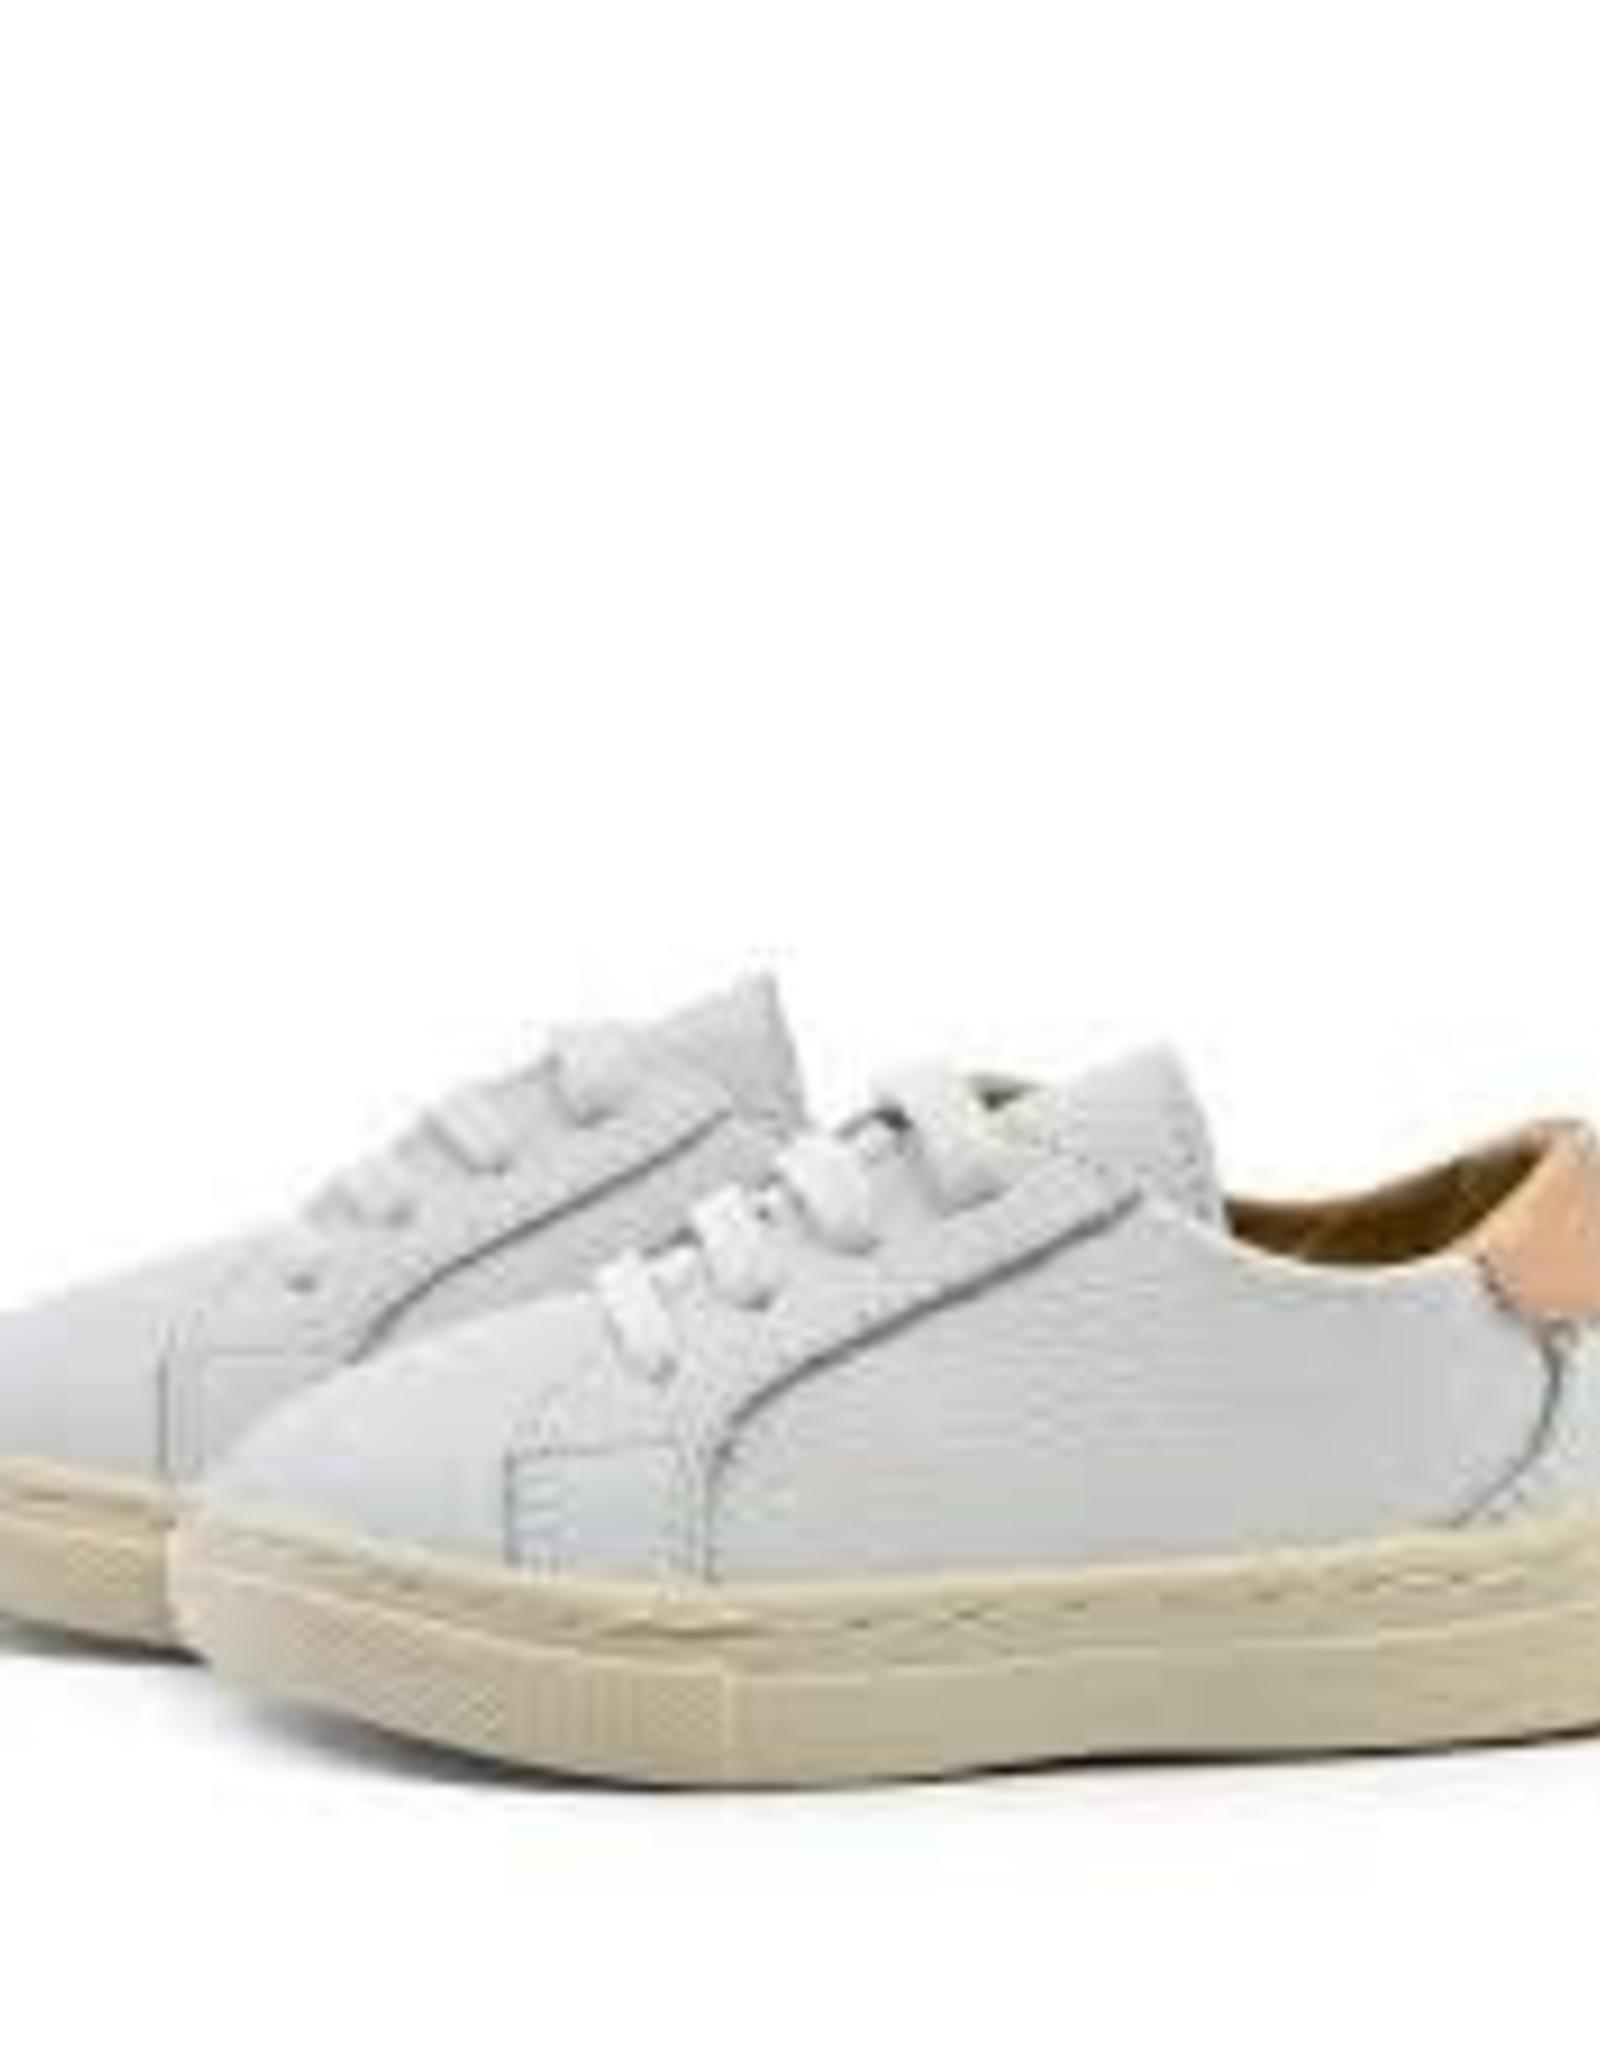 Piper Finn Piper Finn Low Top Sneakers White